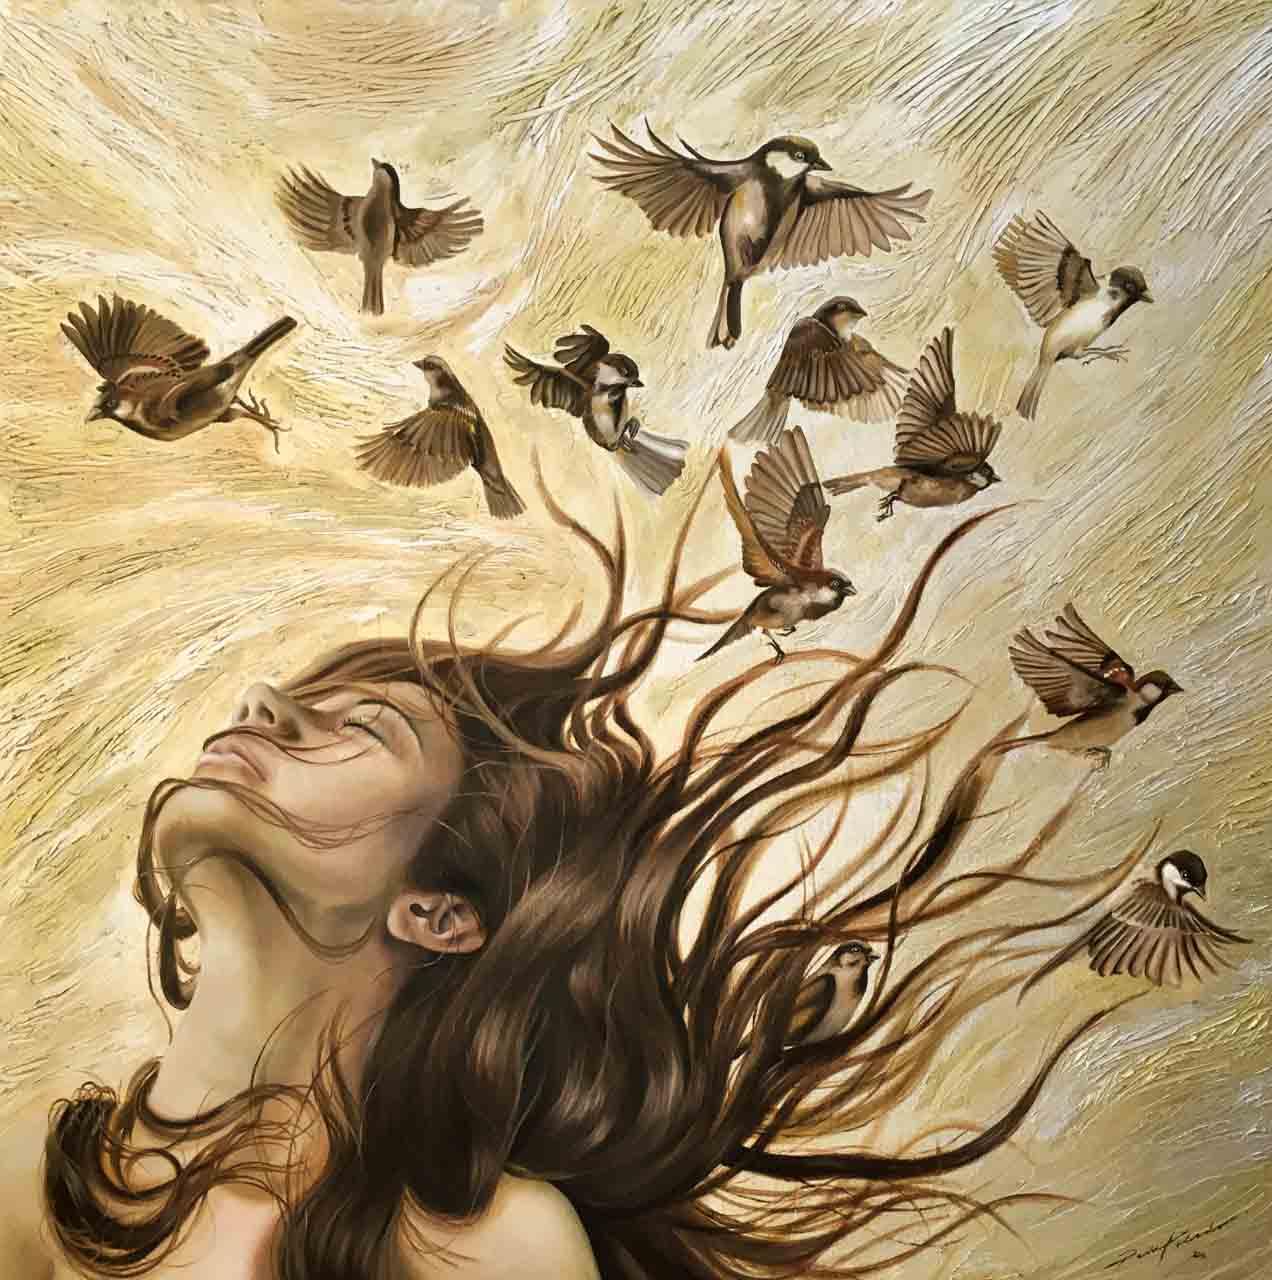 Libertad de Pensamientos / Freedom of Thoughts